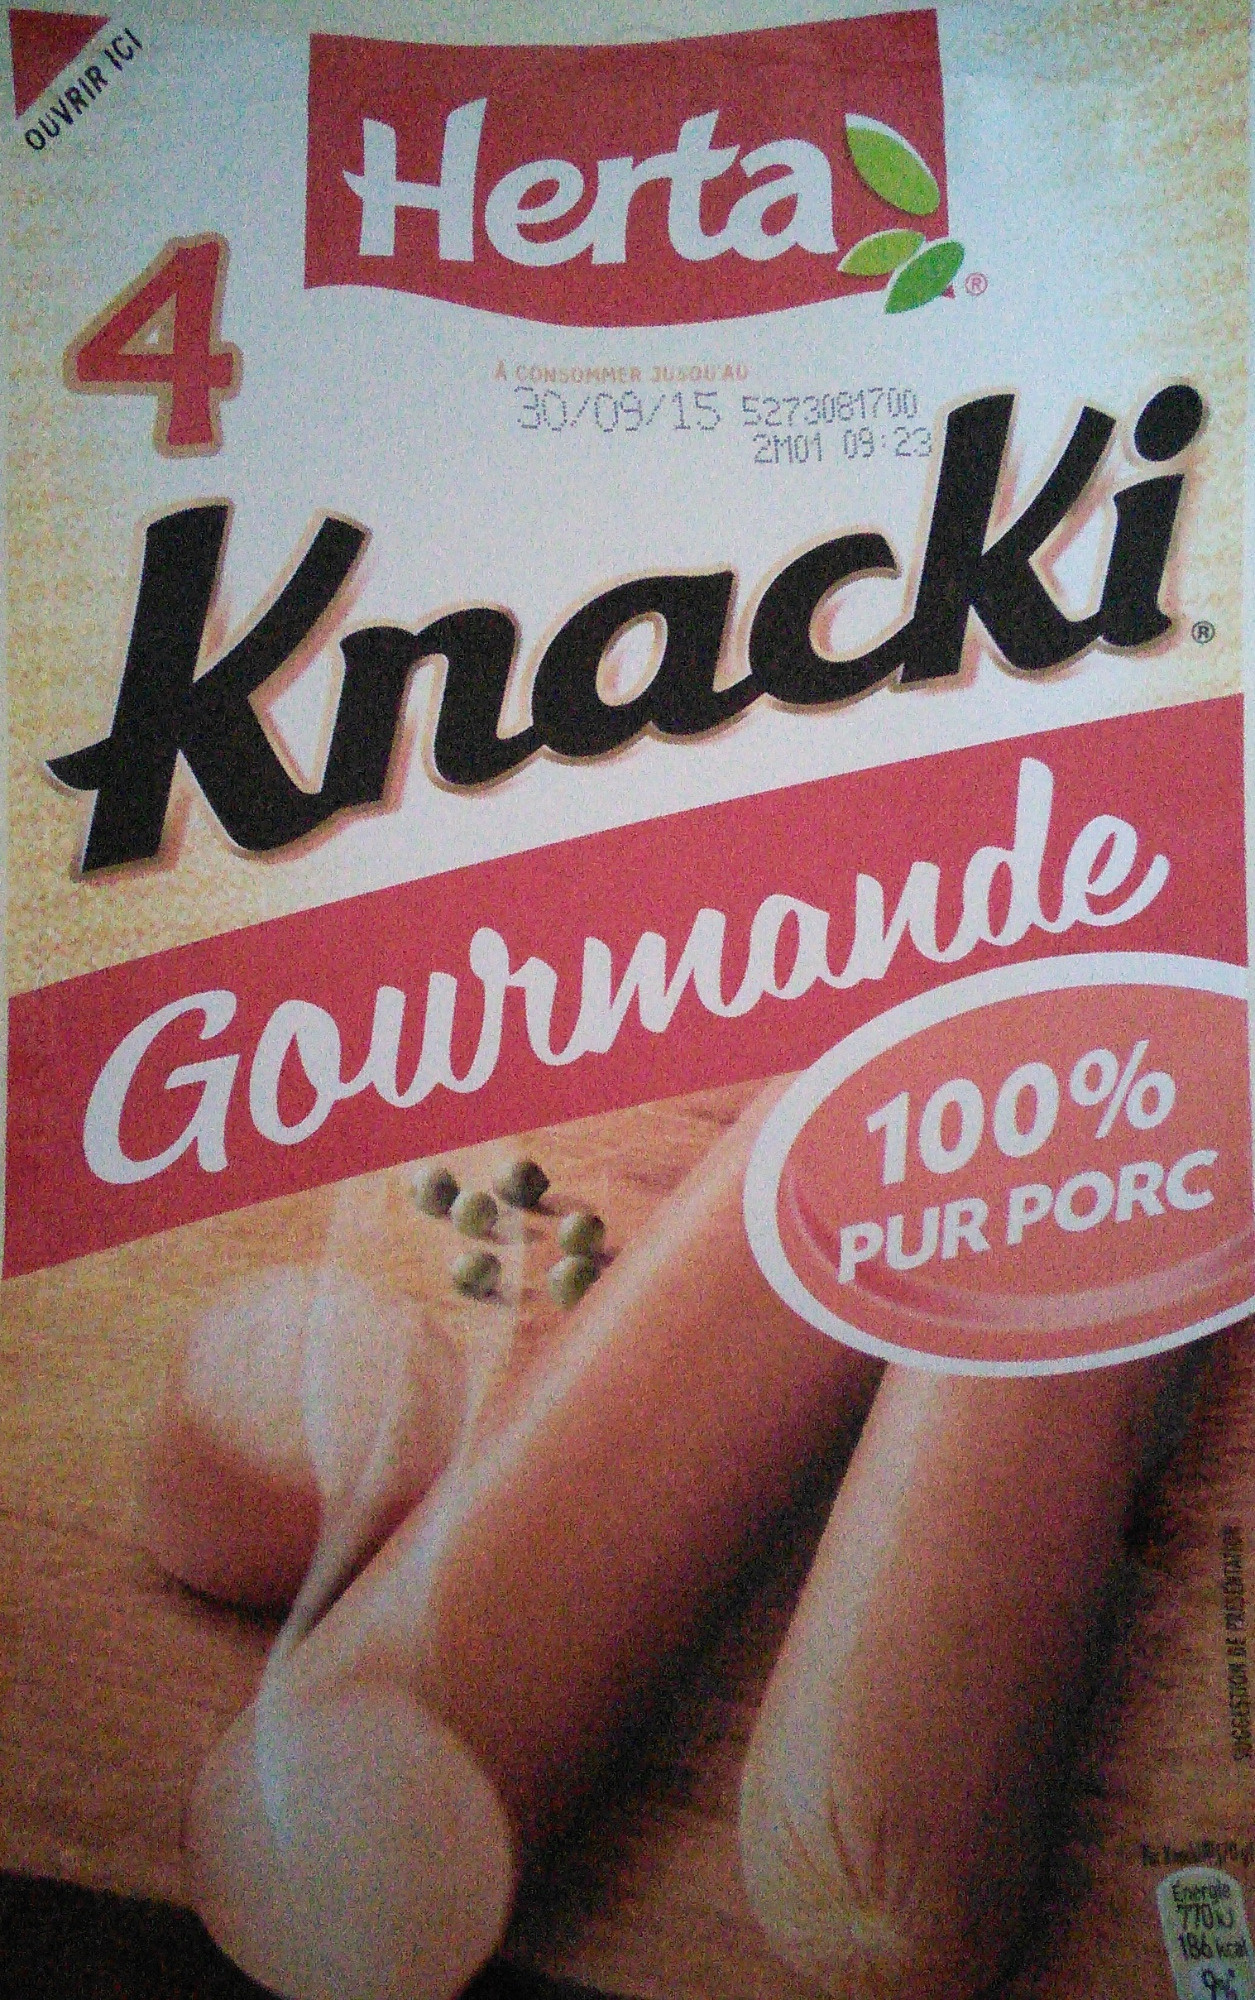 Knacki Gourmande Herta 100% Pur Porc - Product